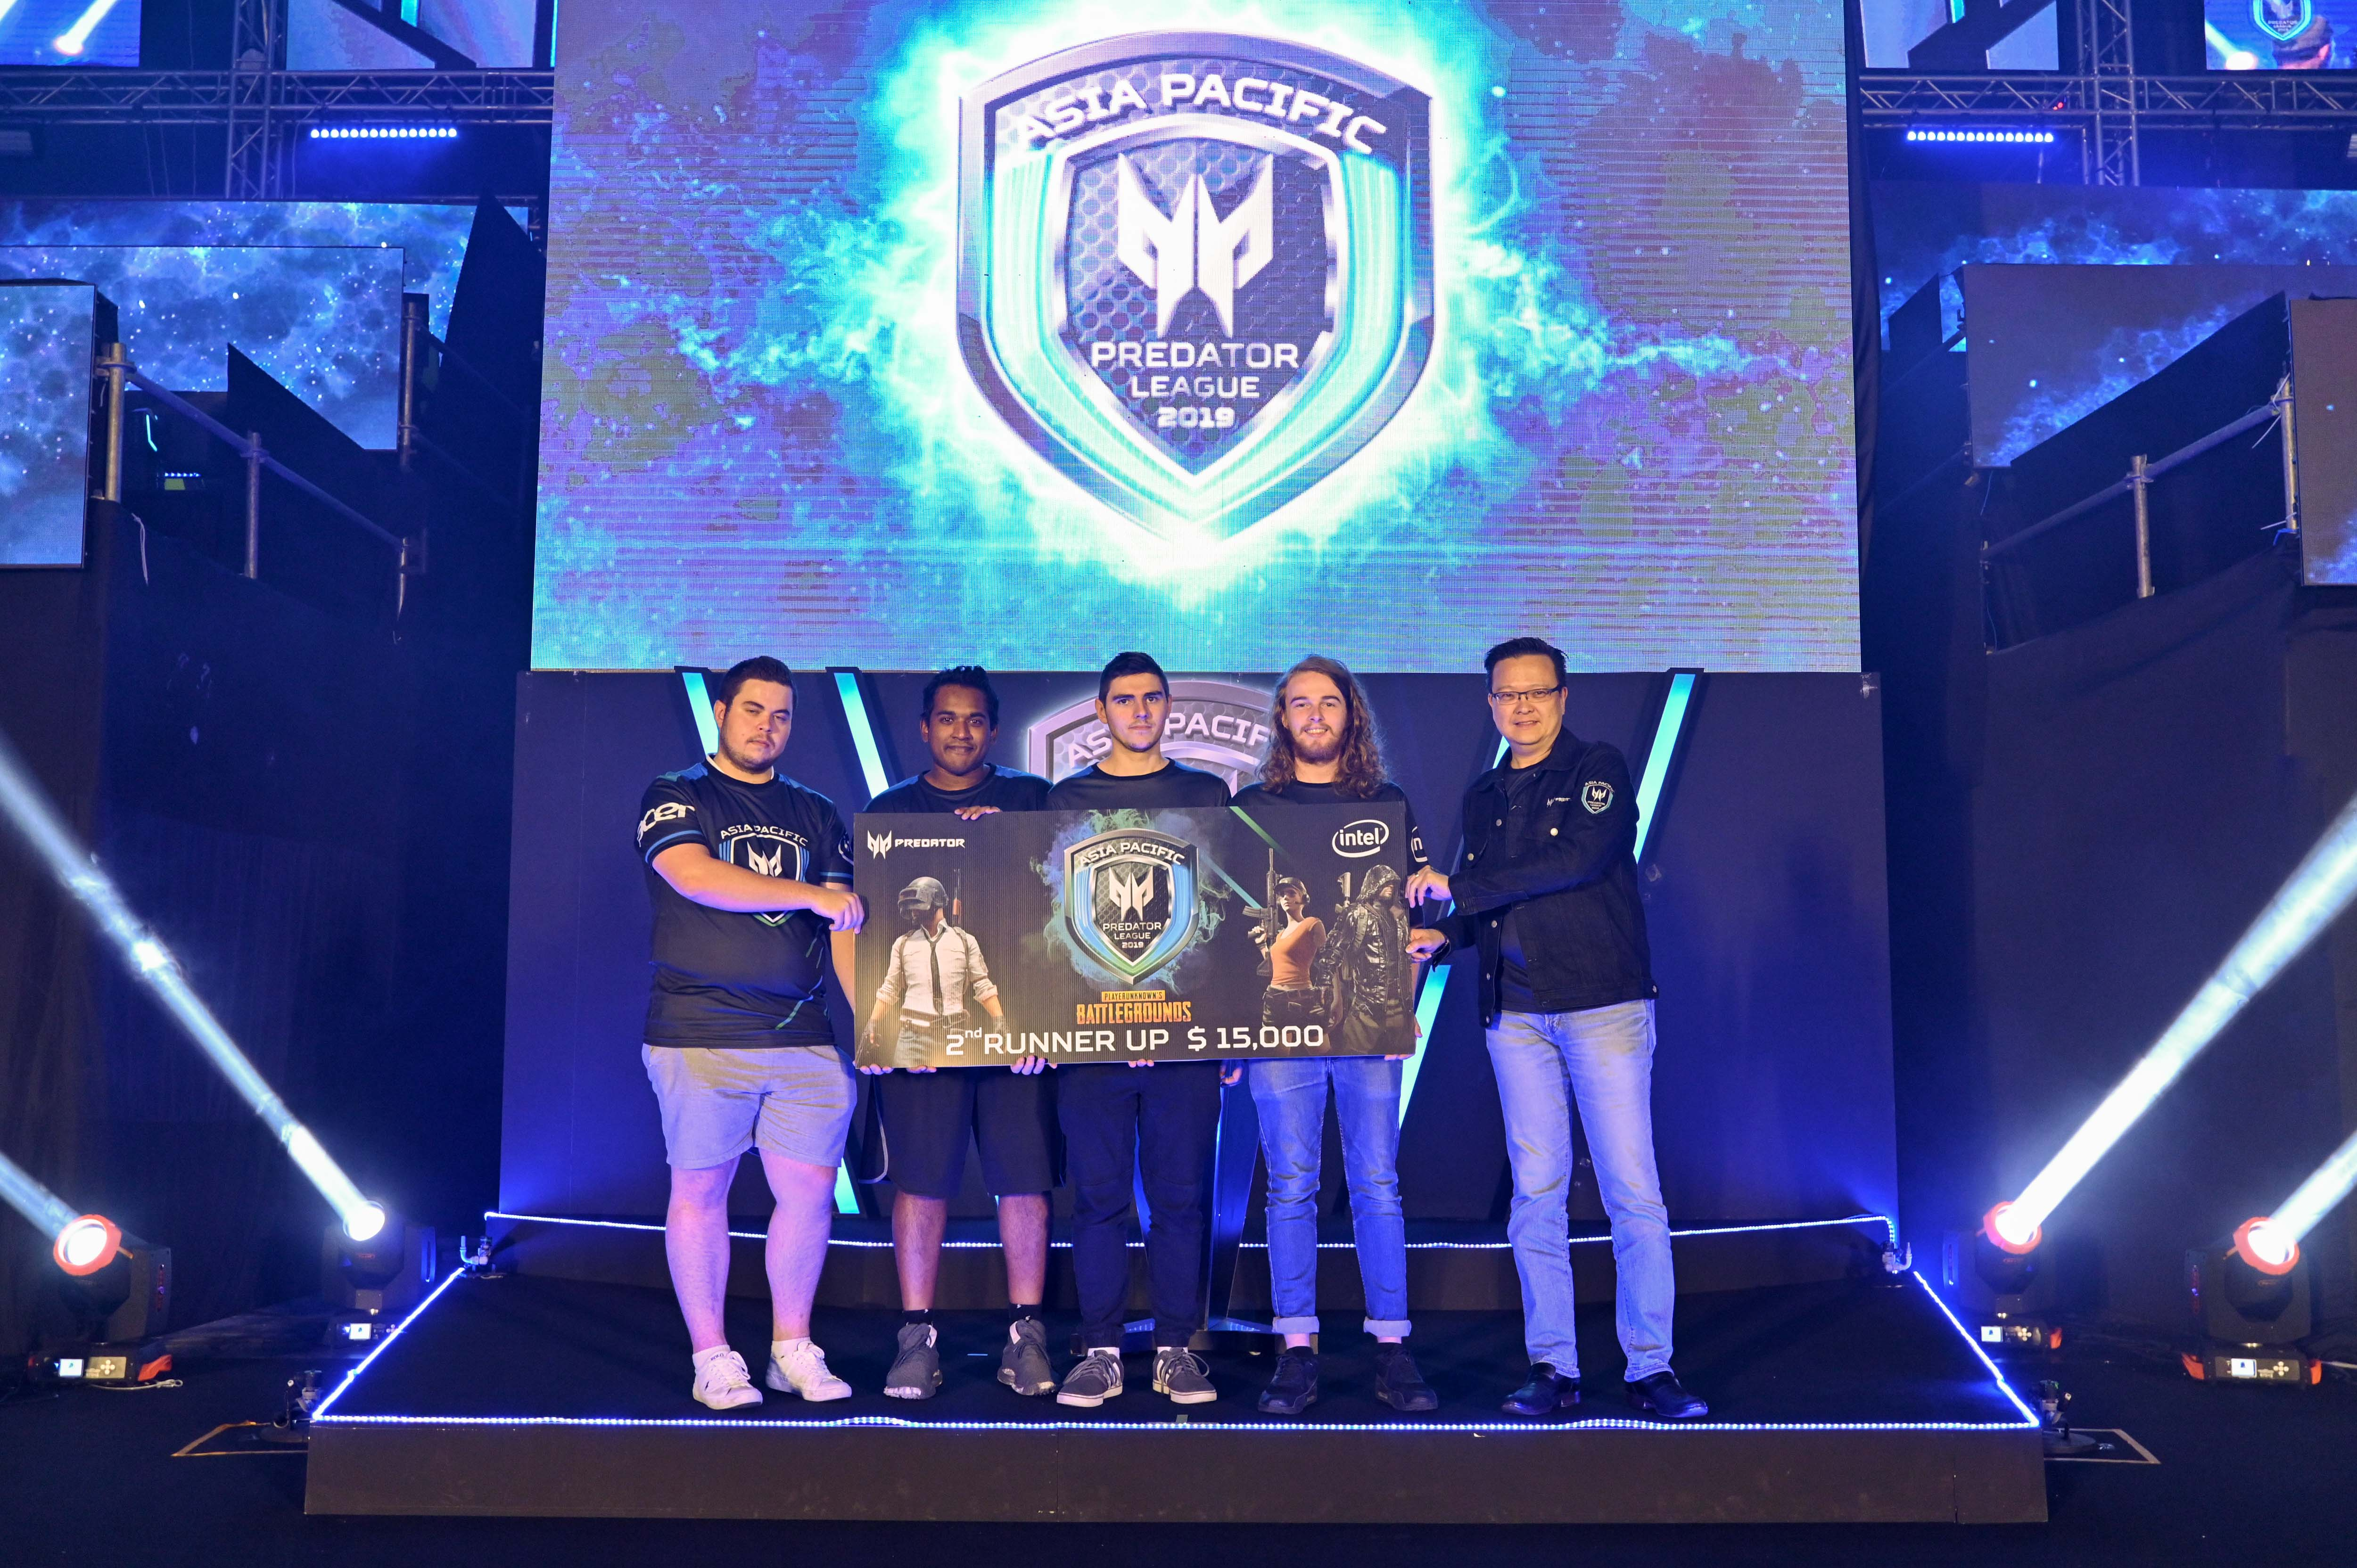 07 dsc 3571 17 02 19 บรรยากาศงาน Asia Pacific Predator League 2019 สุดยอดขุนพลทีมอีสปอร์ตเข้าร่วมการแข่งขันรอบแกรนด์ไฟนอล